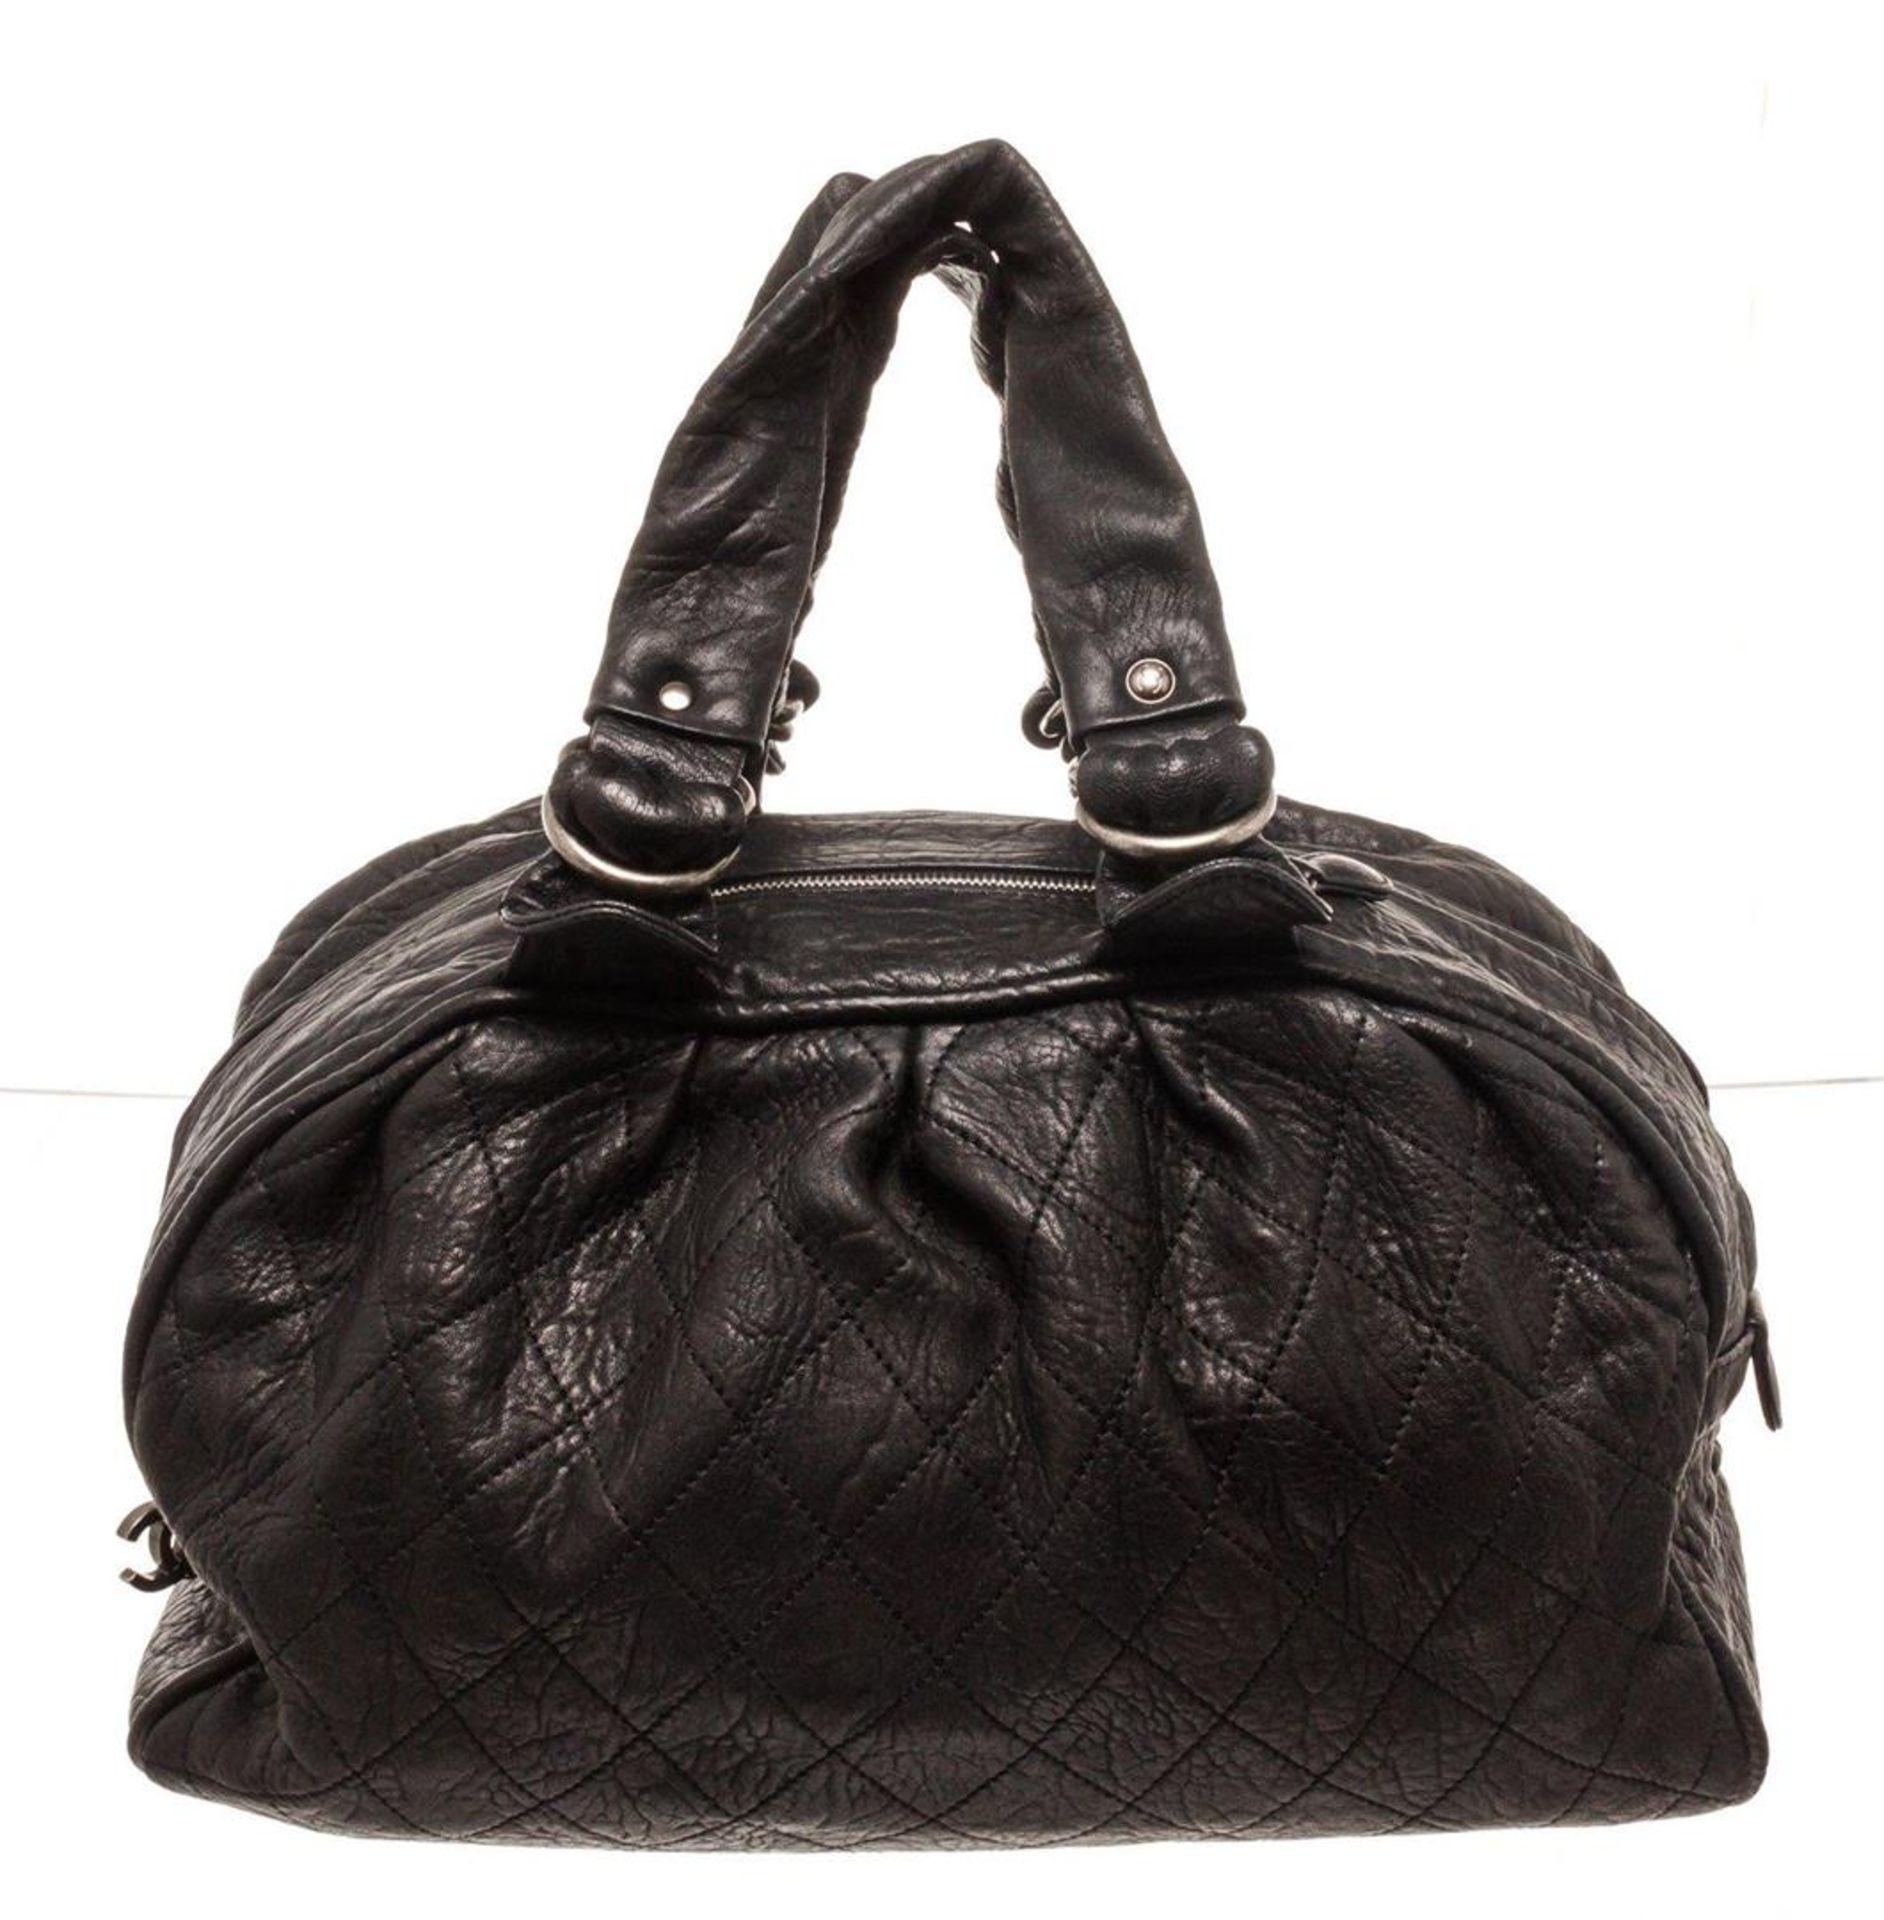 Chanel Black Leather Large Boston Bag